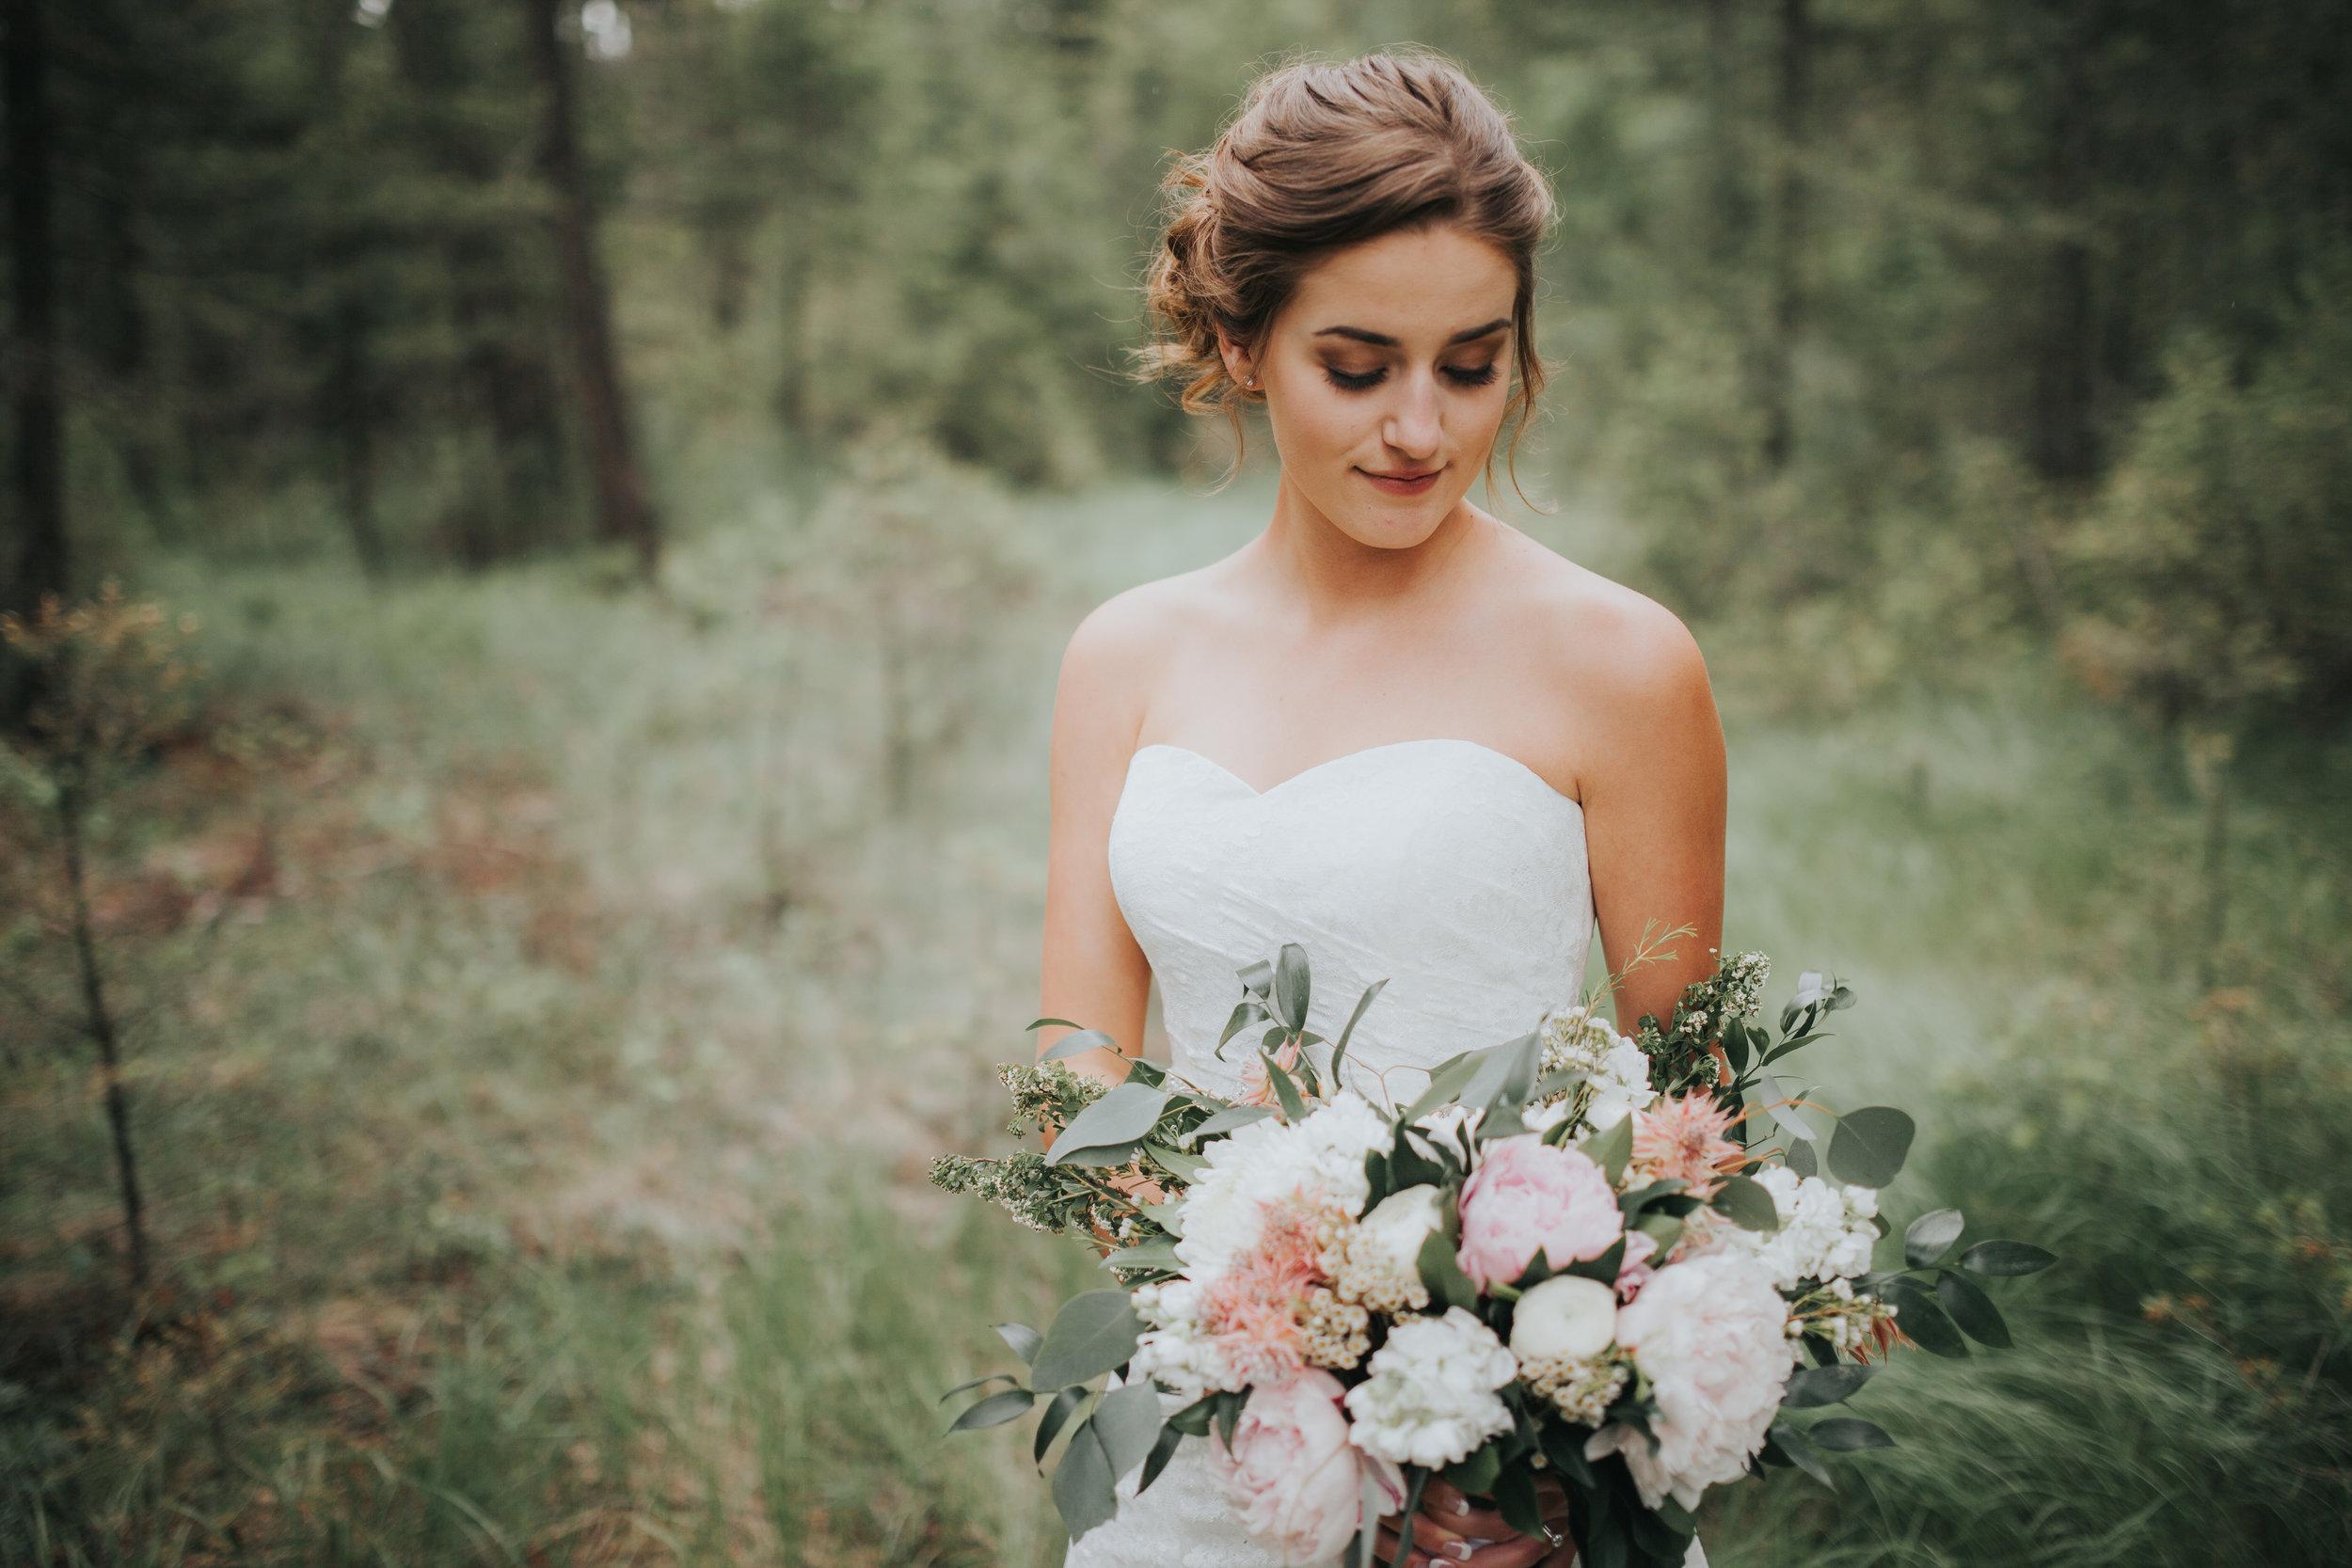 Ryter 4 - Bridal Portraits-147.jpg